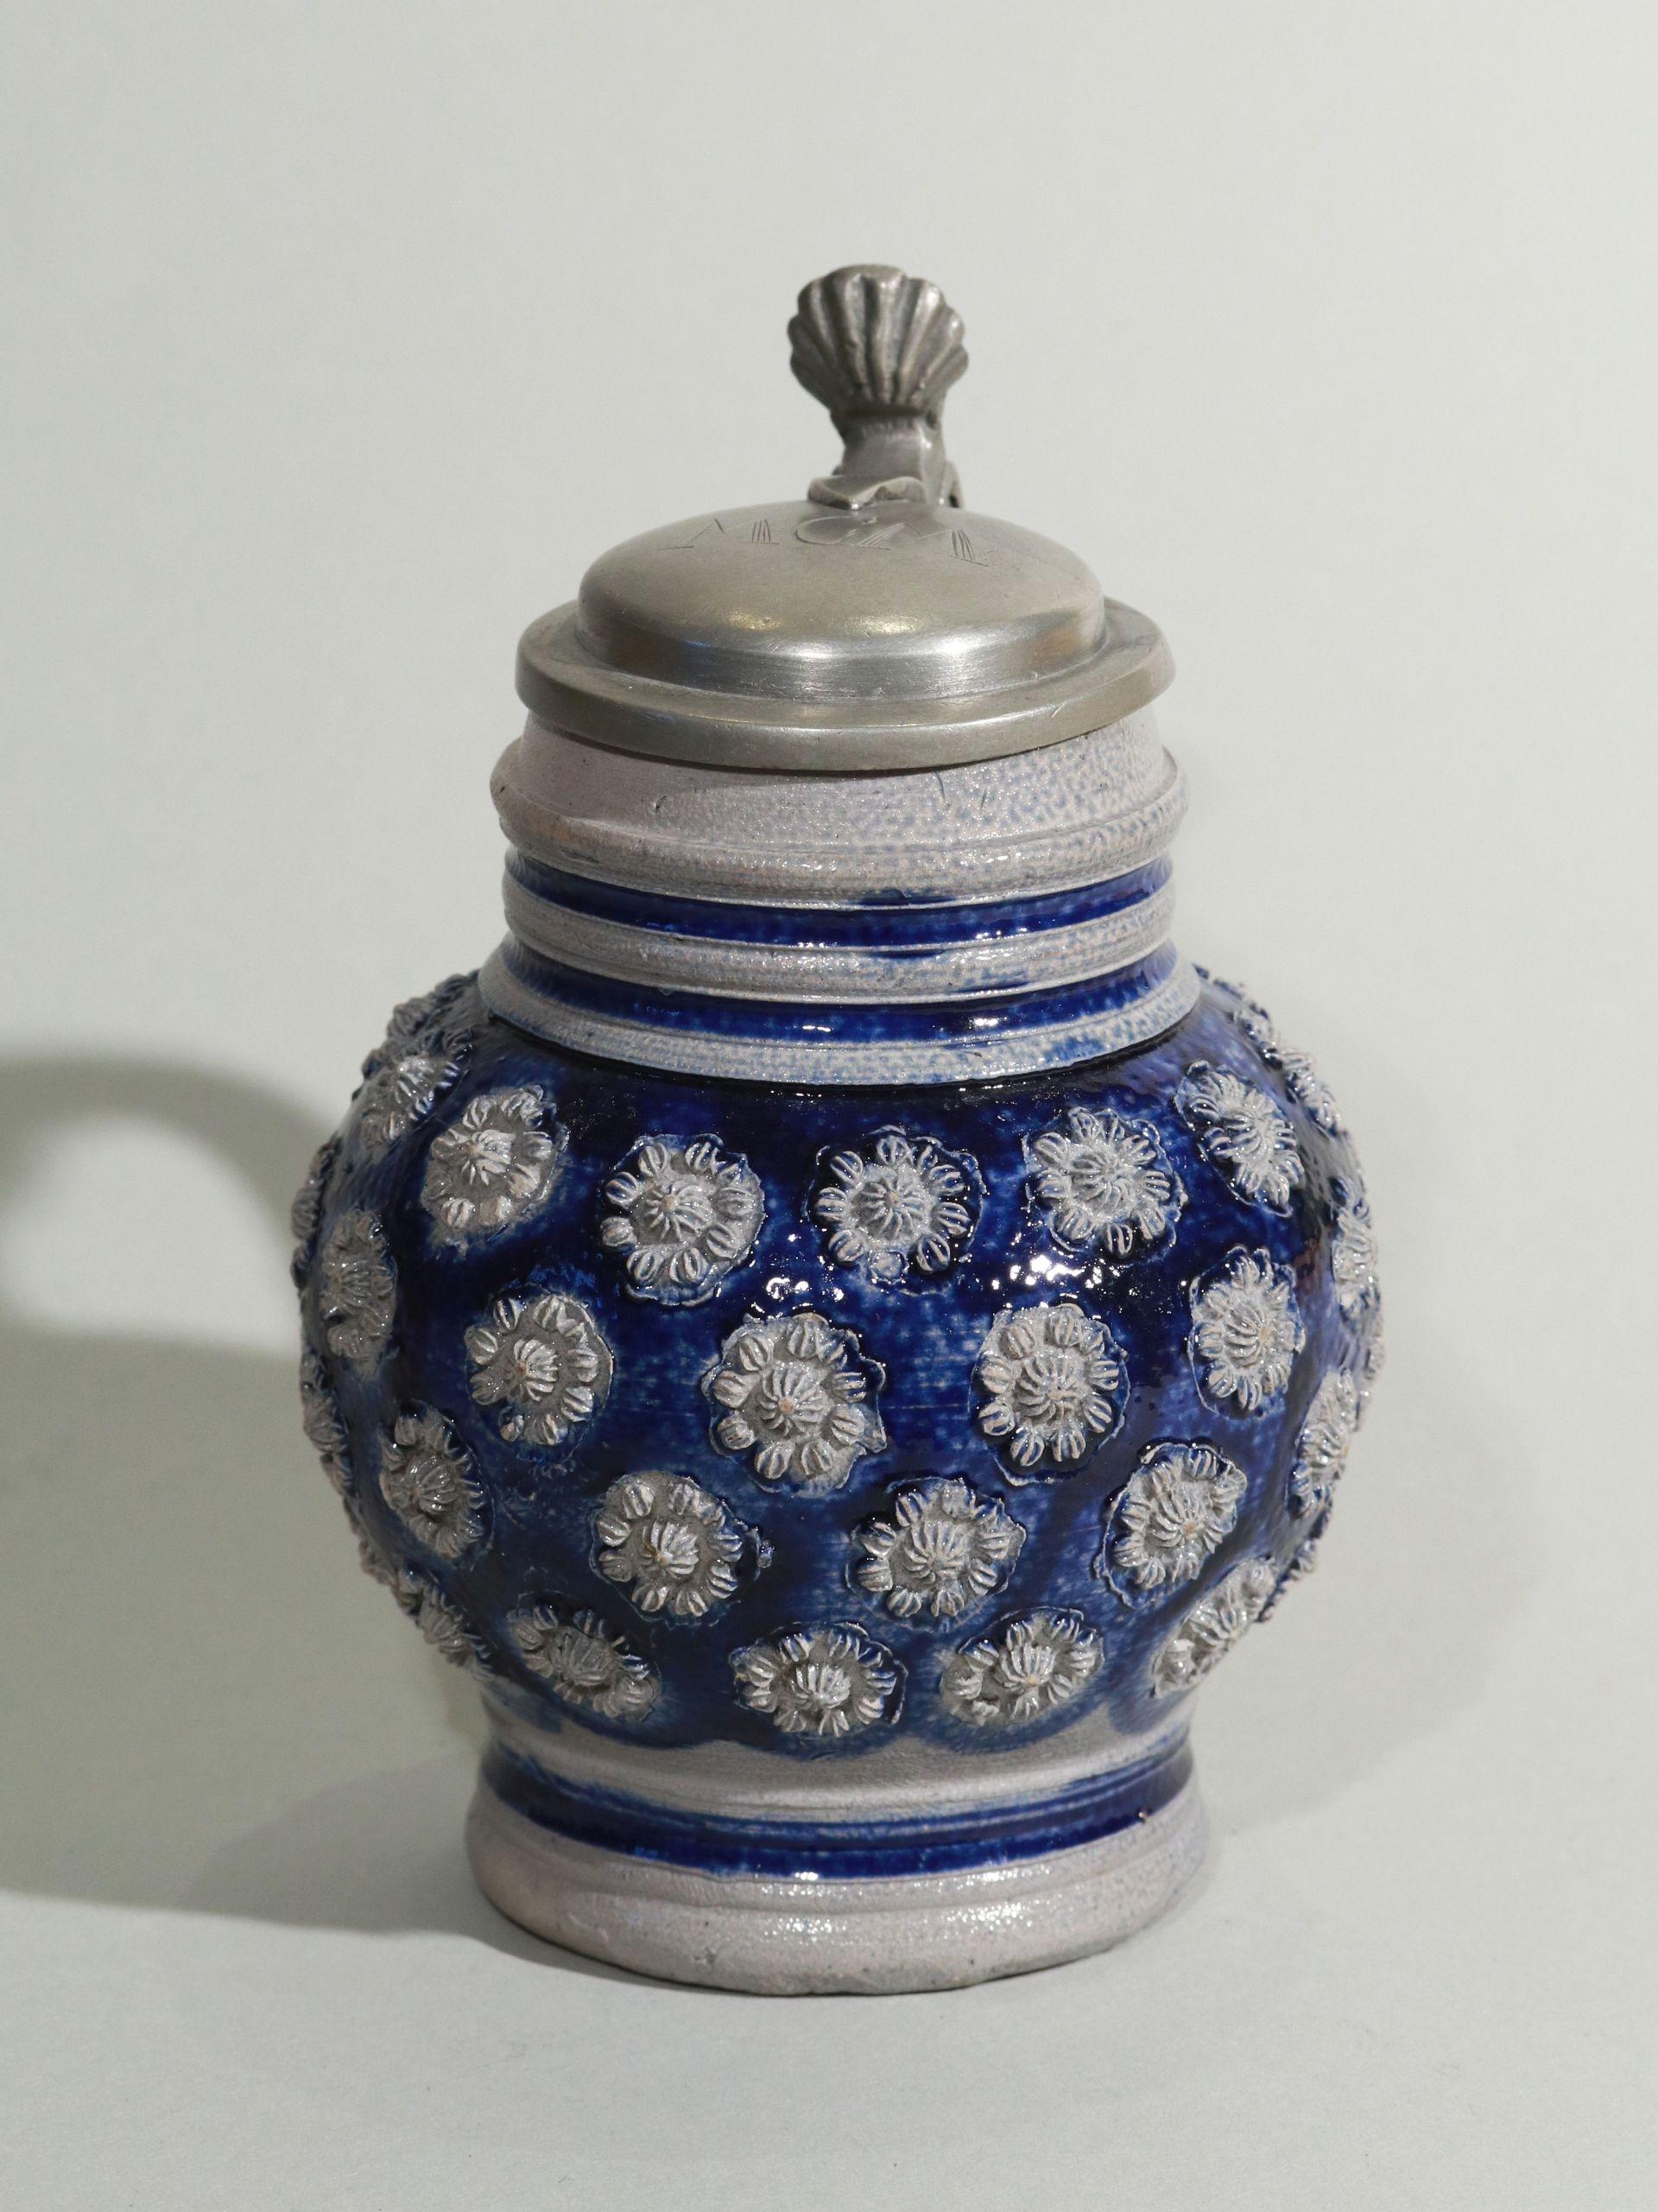 westerwald-westerwälder-kugelbauchkrug-um-1680 - blue salt glazed stoneware - jug